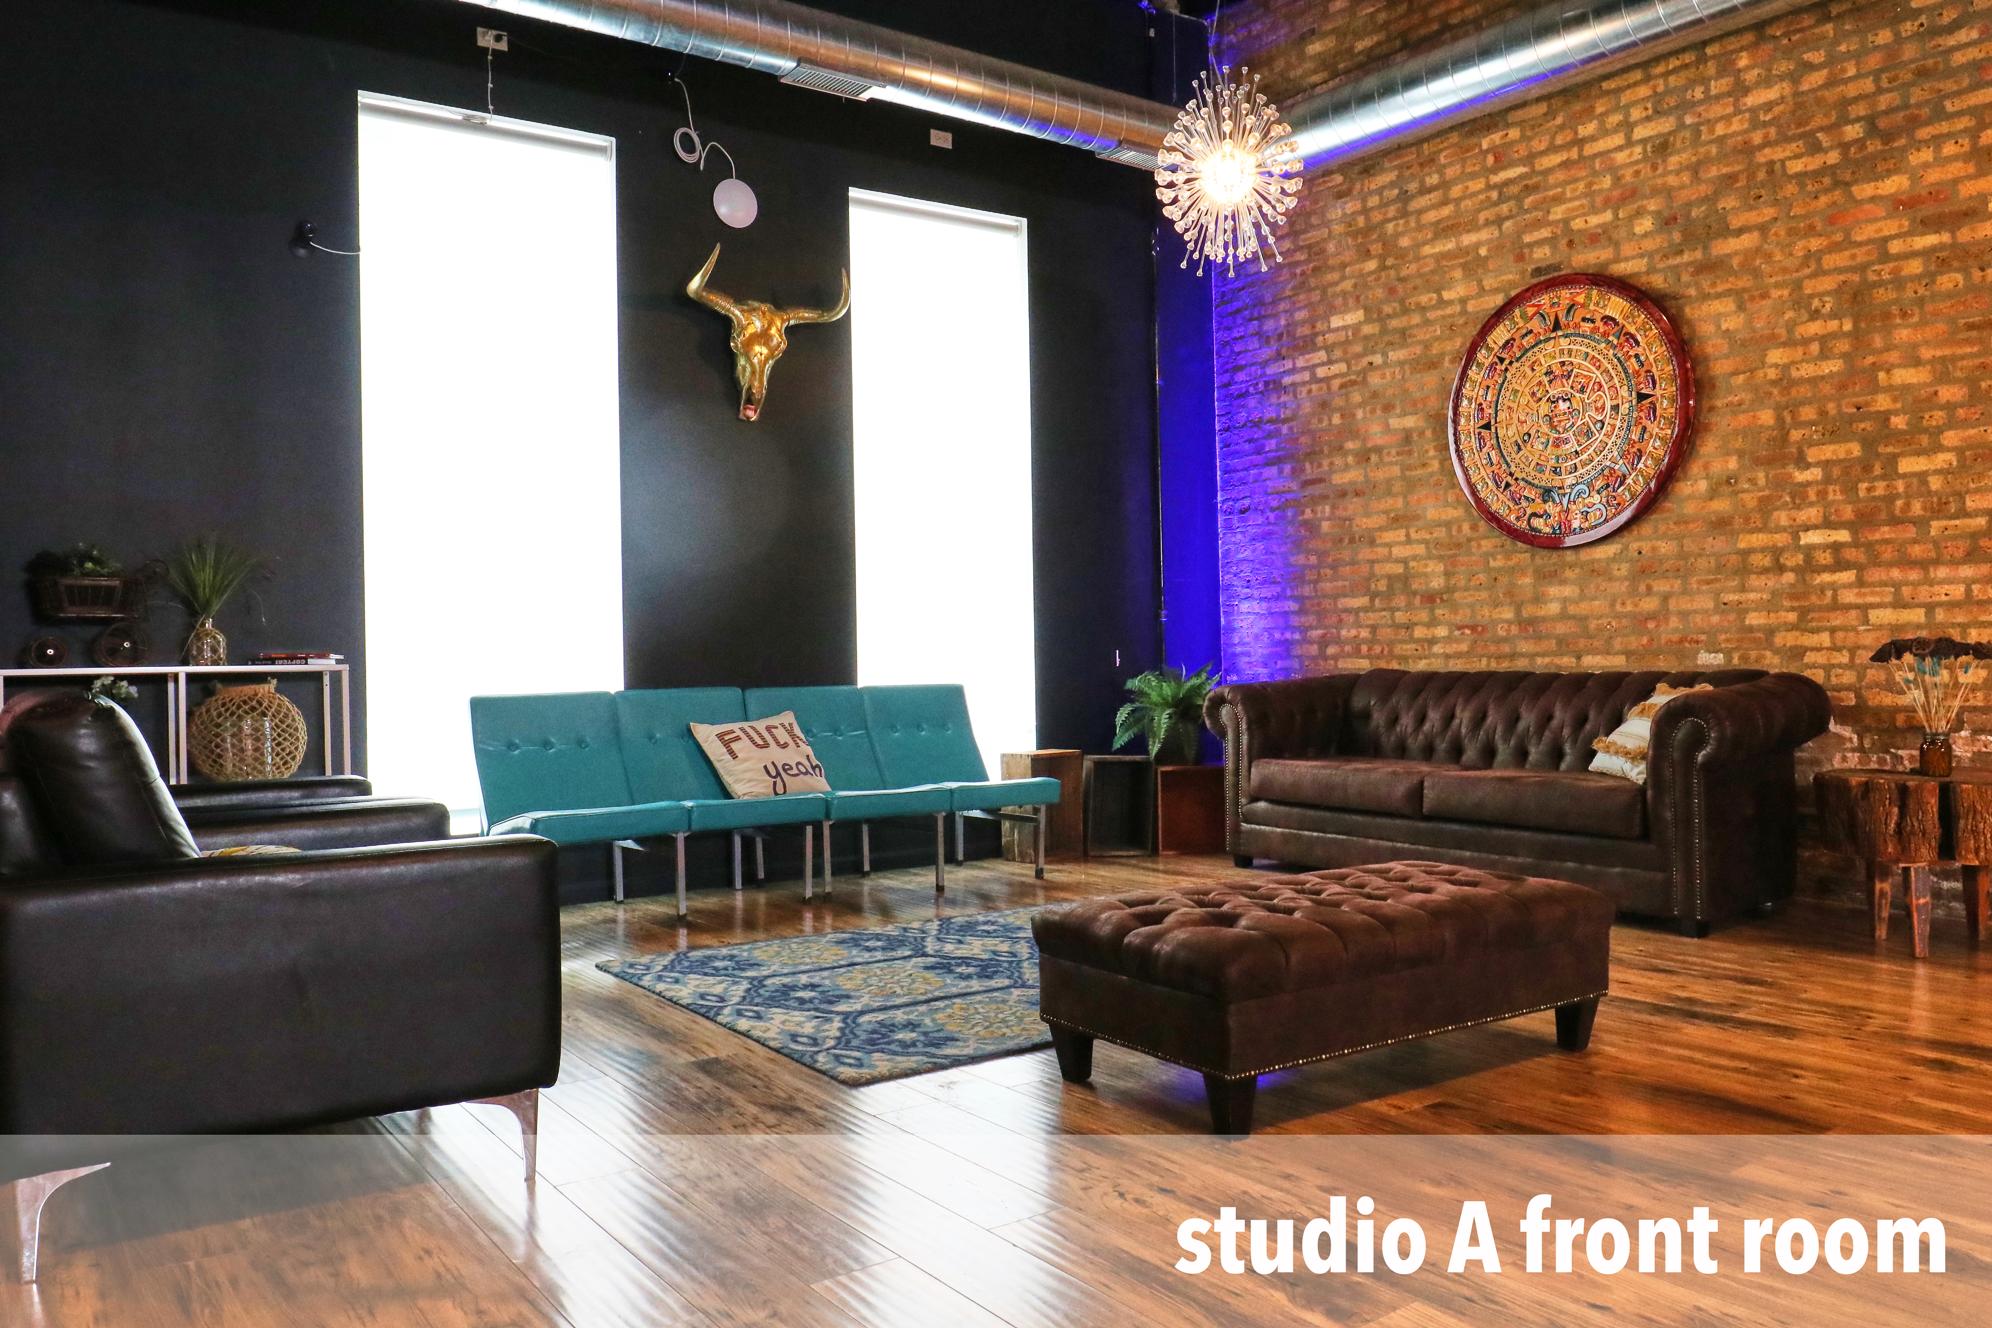 studio-A-front-room-2.png